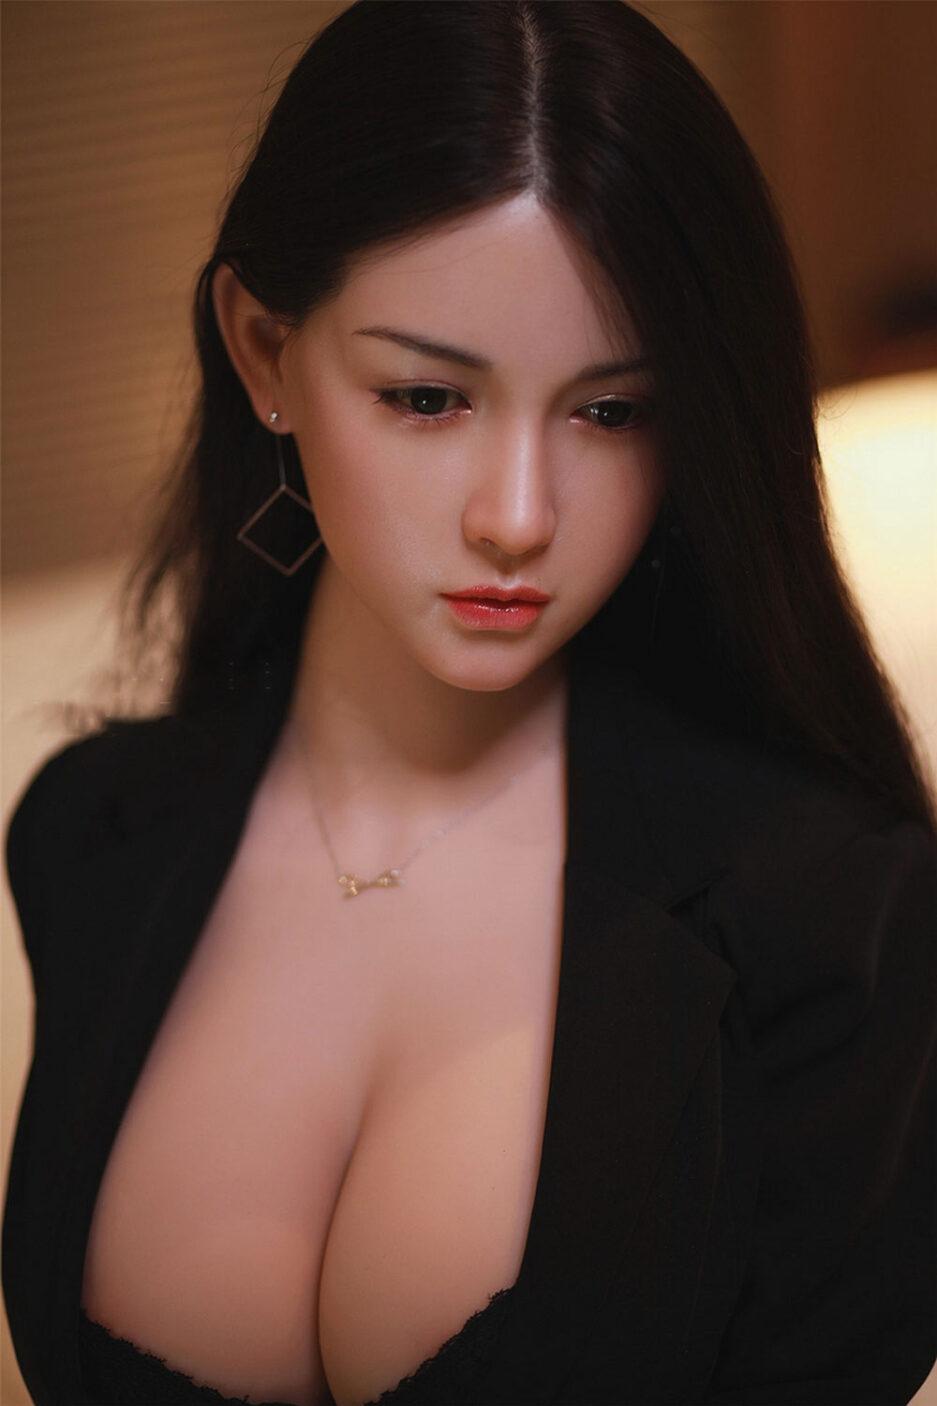 Black long hair silicone sex doll